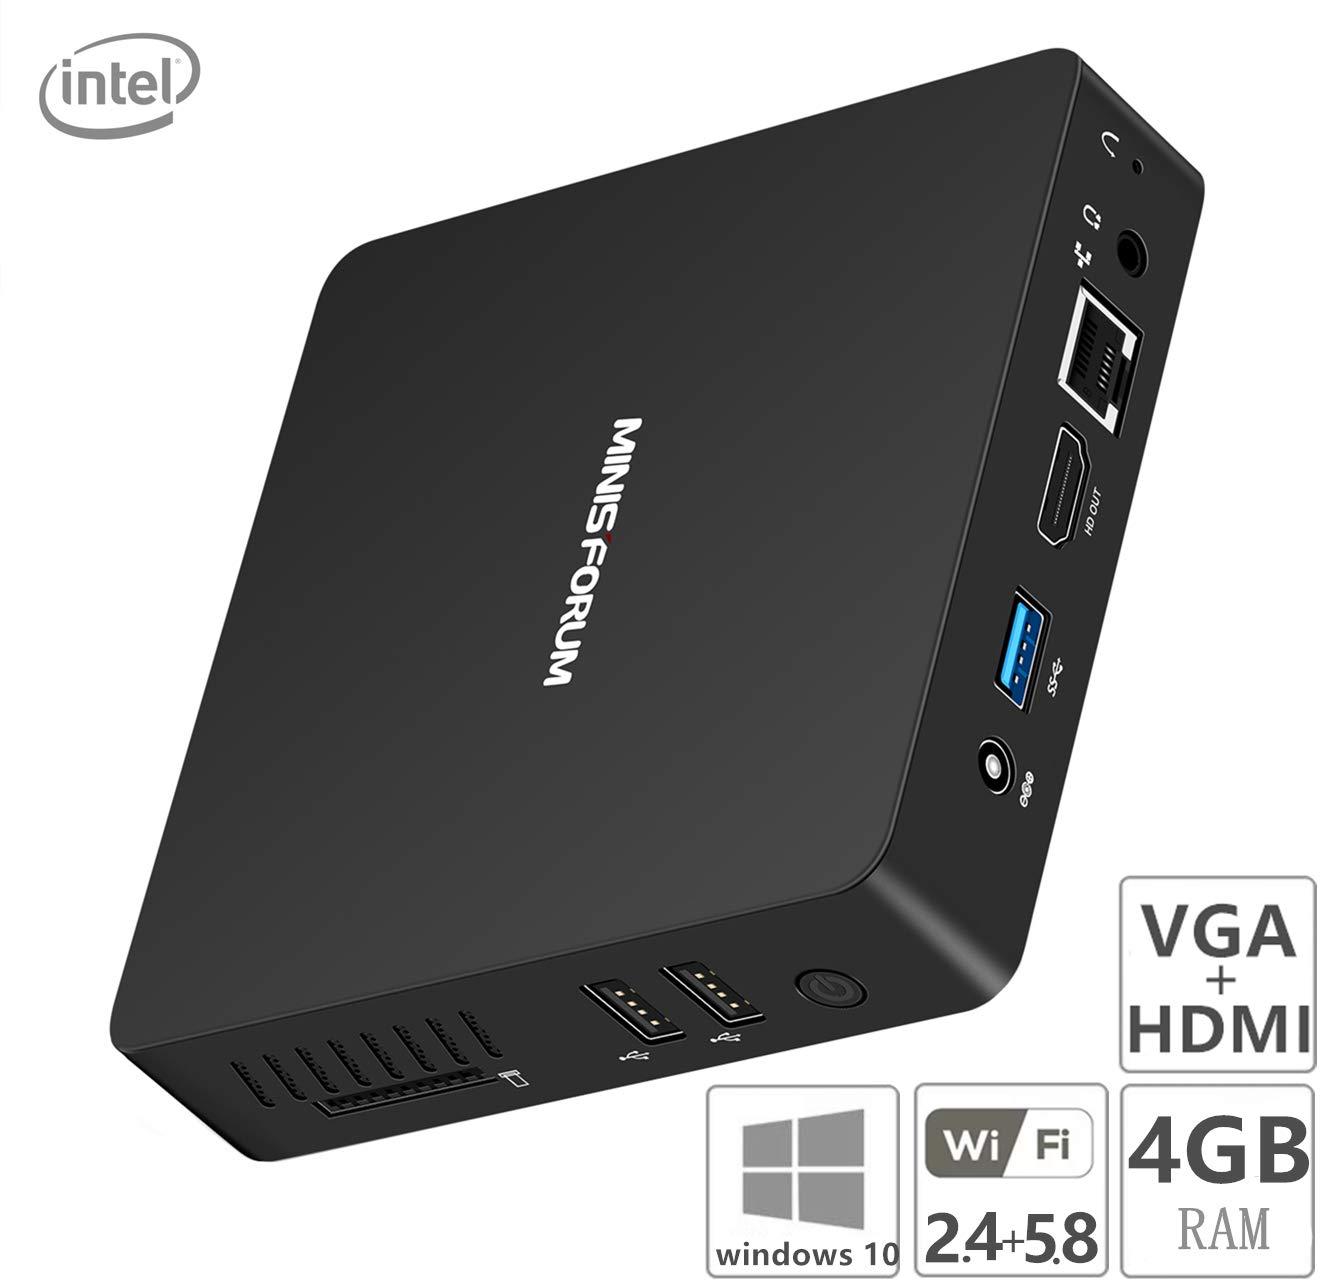 TALLA 4+64GB/ Z8350 (HDMI&VGA Port). Z83-F Fanless Mini PC, Procesador Intel Atom x5-Z8350 (caché de 2M, hasta 1.92GHz) 4K/4GB/64GB 1000Mbps LAN 2.4/5.8 WiFi de Banda Dual BT 4.0 Pantalla Dual con Puertos HDMI&VGA